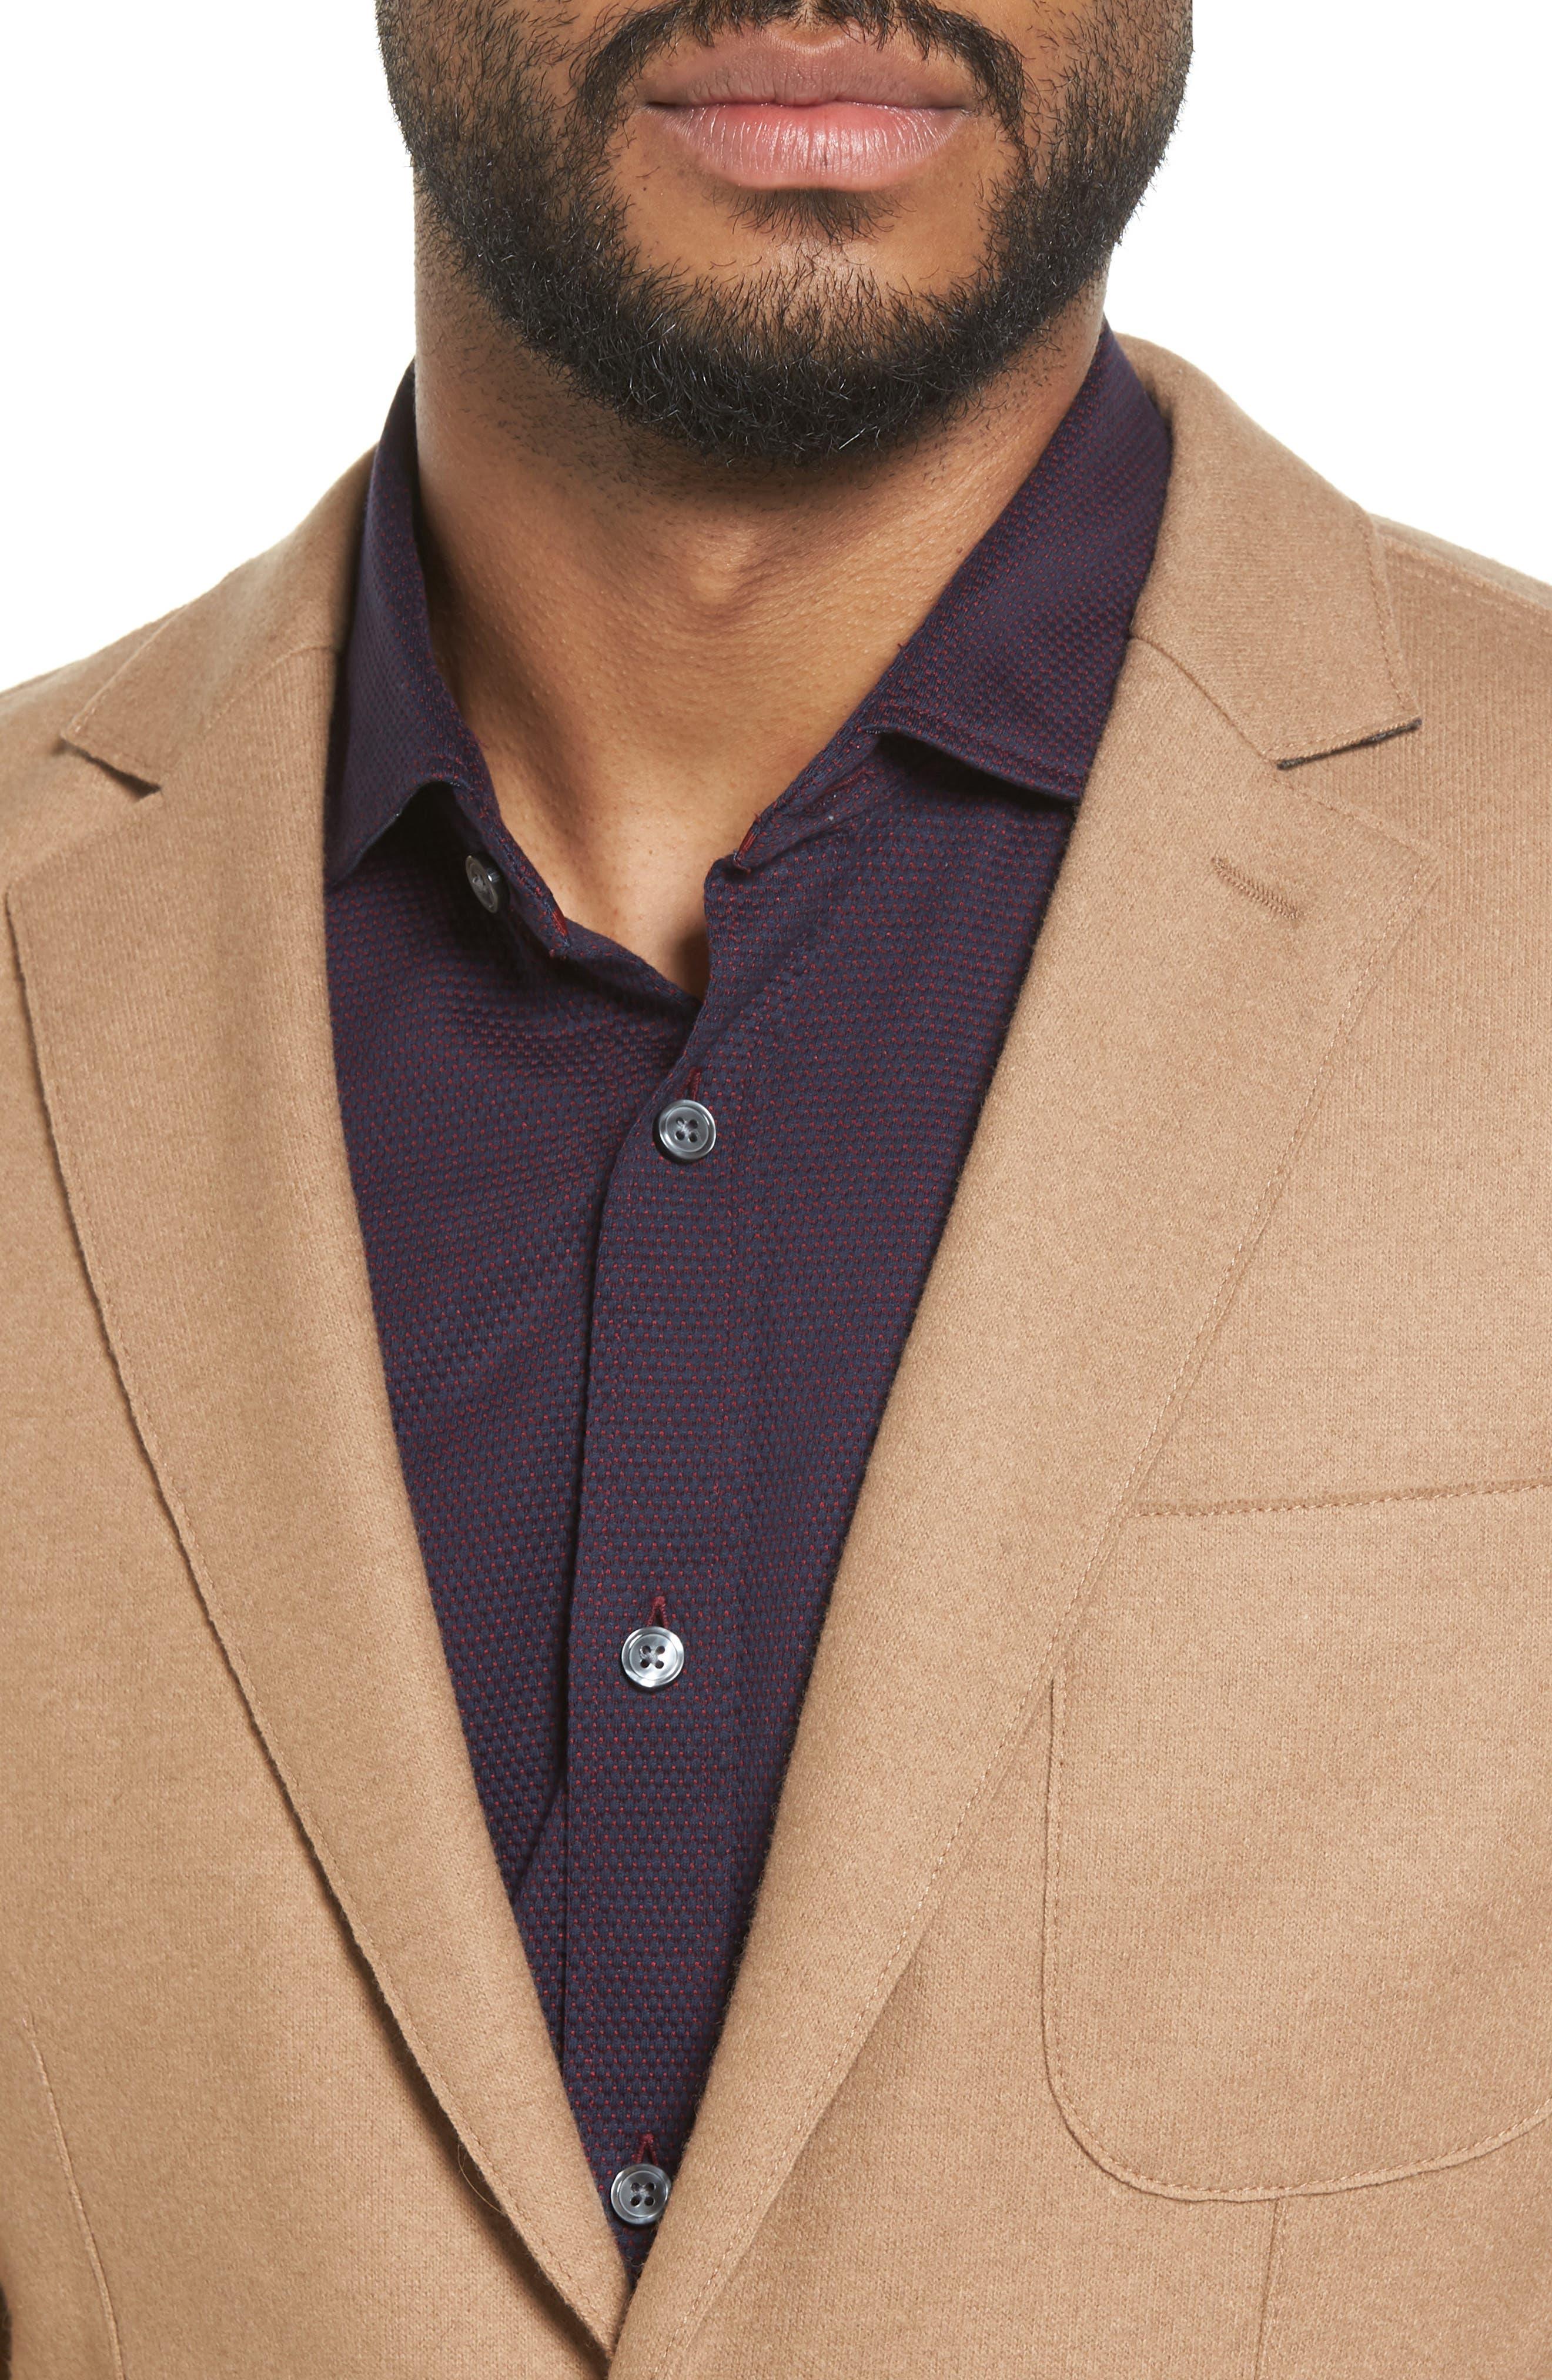 Nordin Trim Fit Virgin Wool Sport Coat,                             Alternate thumbnail 4, color,                             262